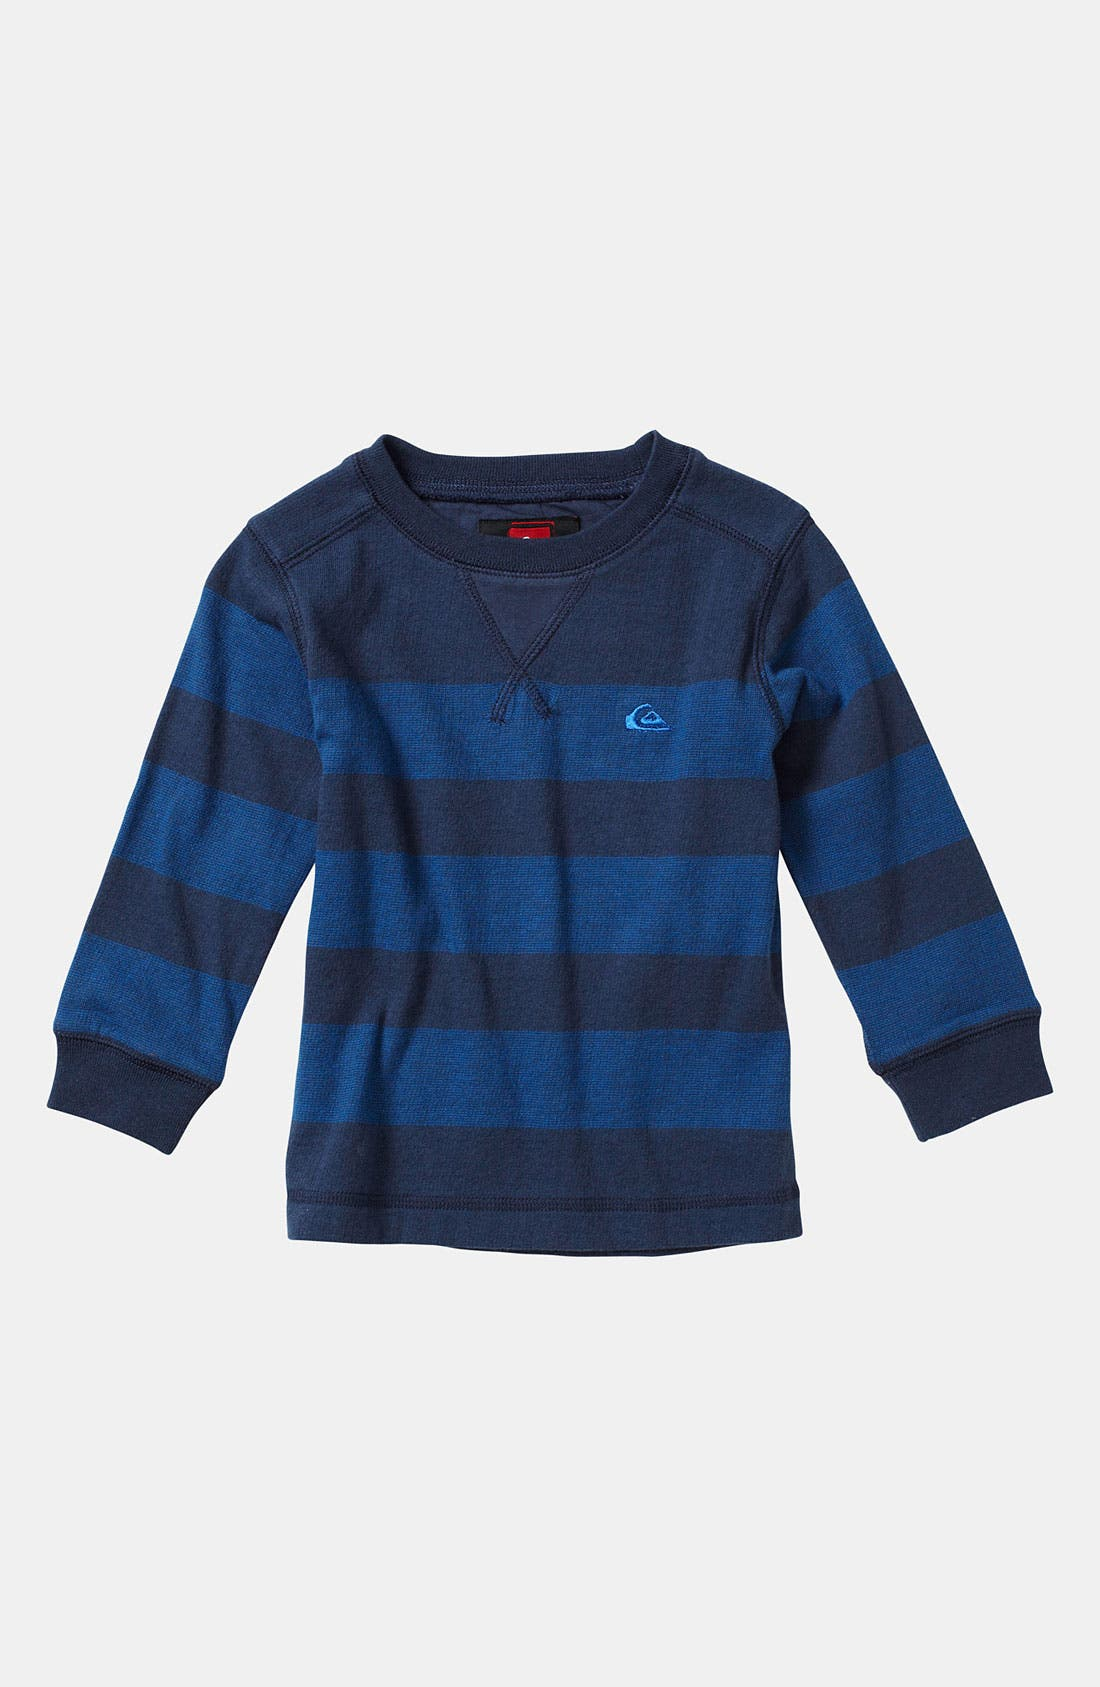 Alternate Image 1 Selected - Quiksilver 'Snit' Stripe Shirt (Toddler)